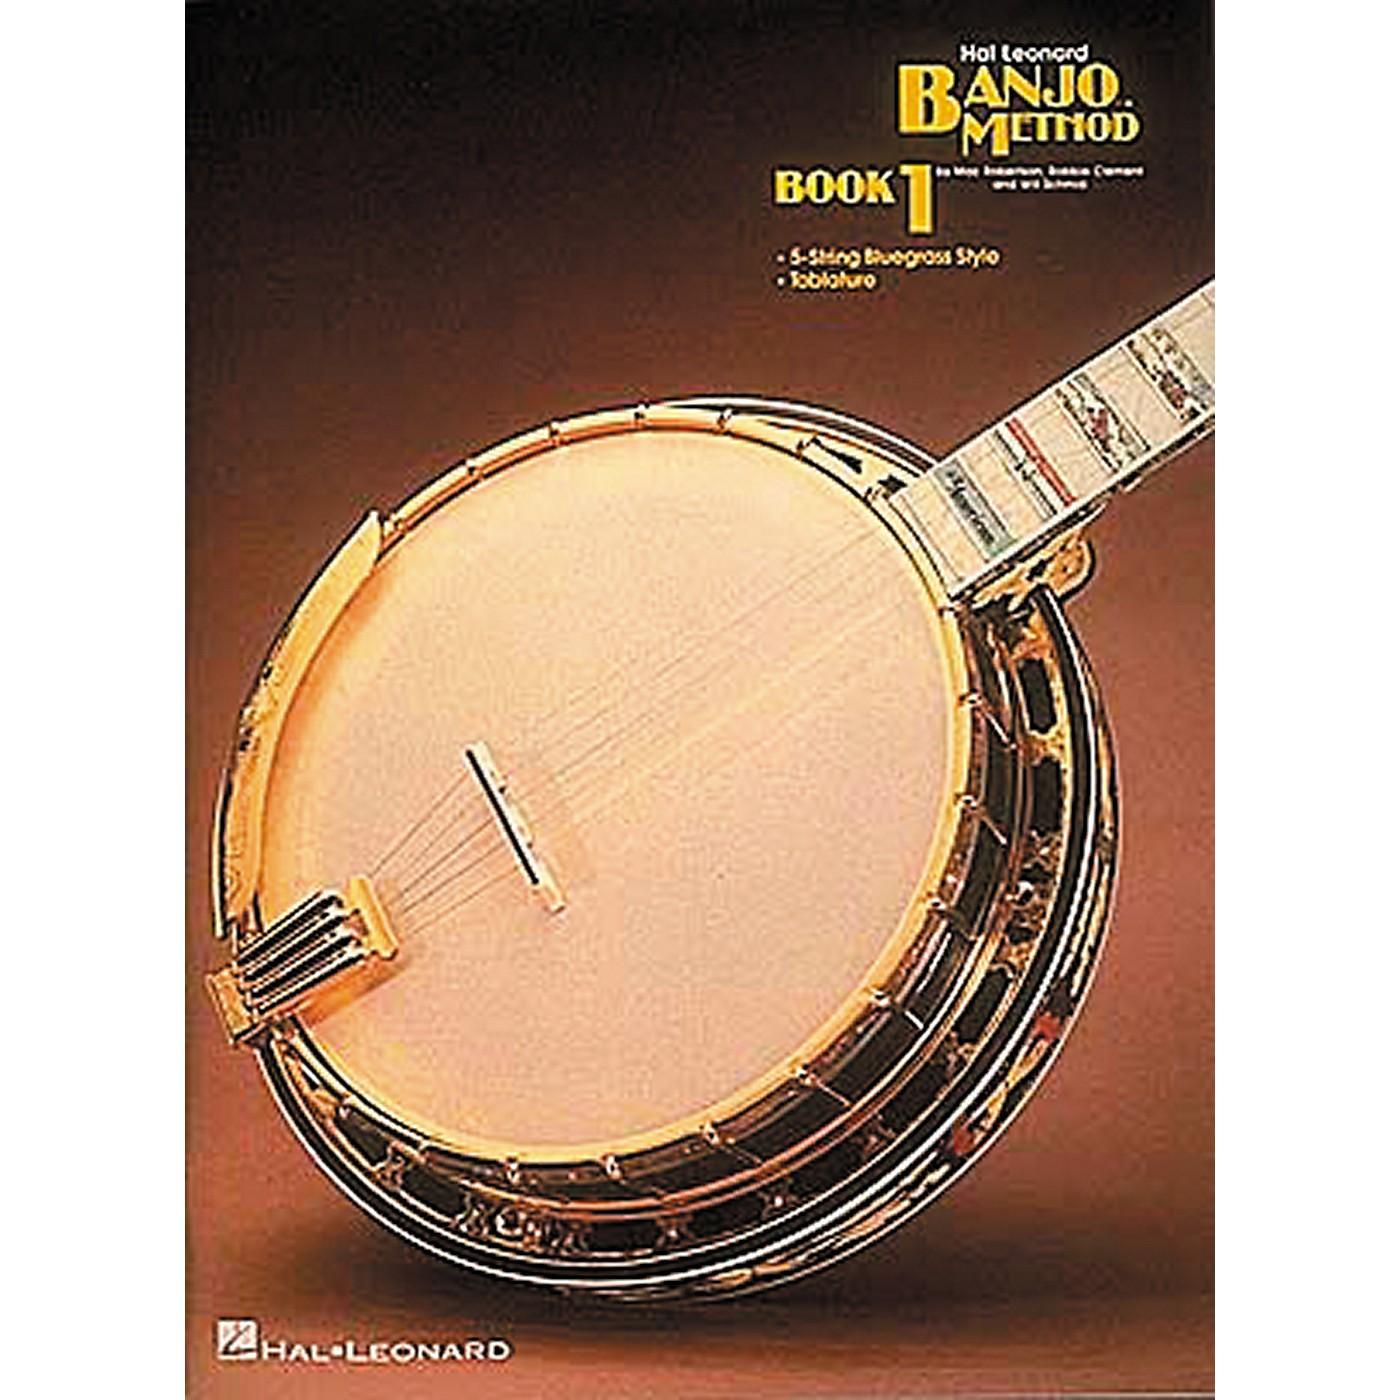 Hal Leonard Banjo Method Book 1 thumbnail